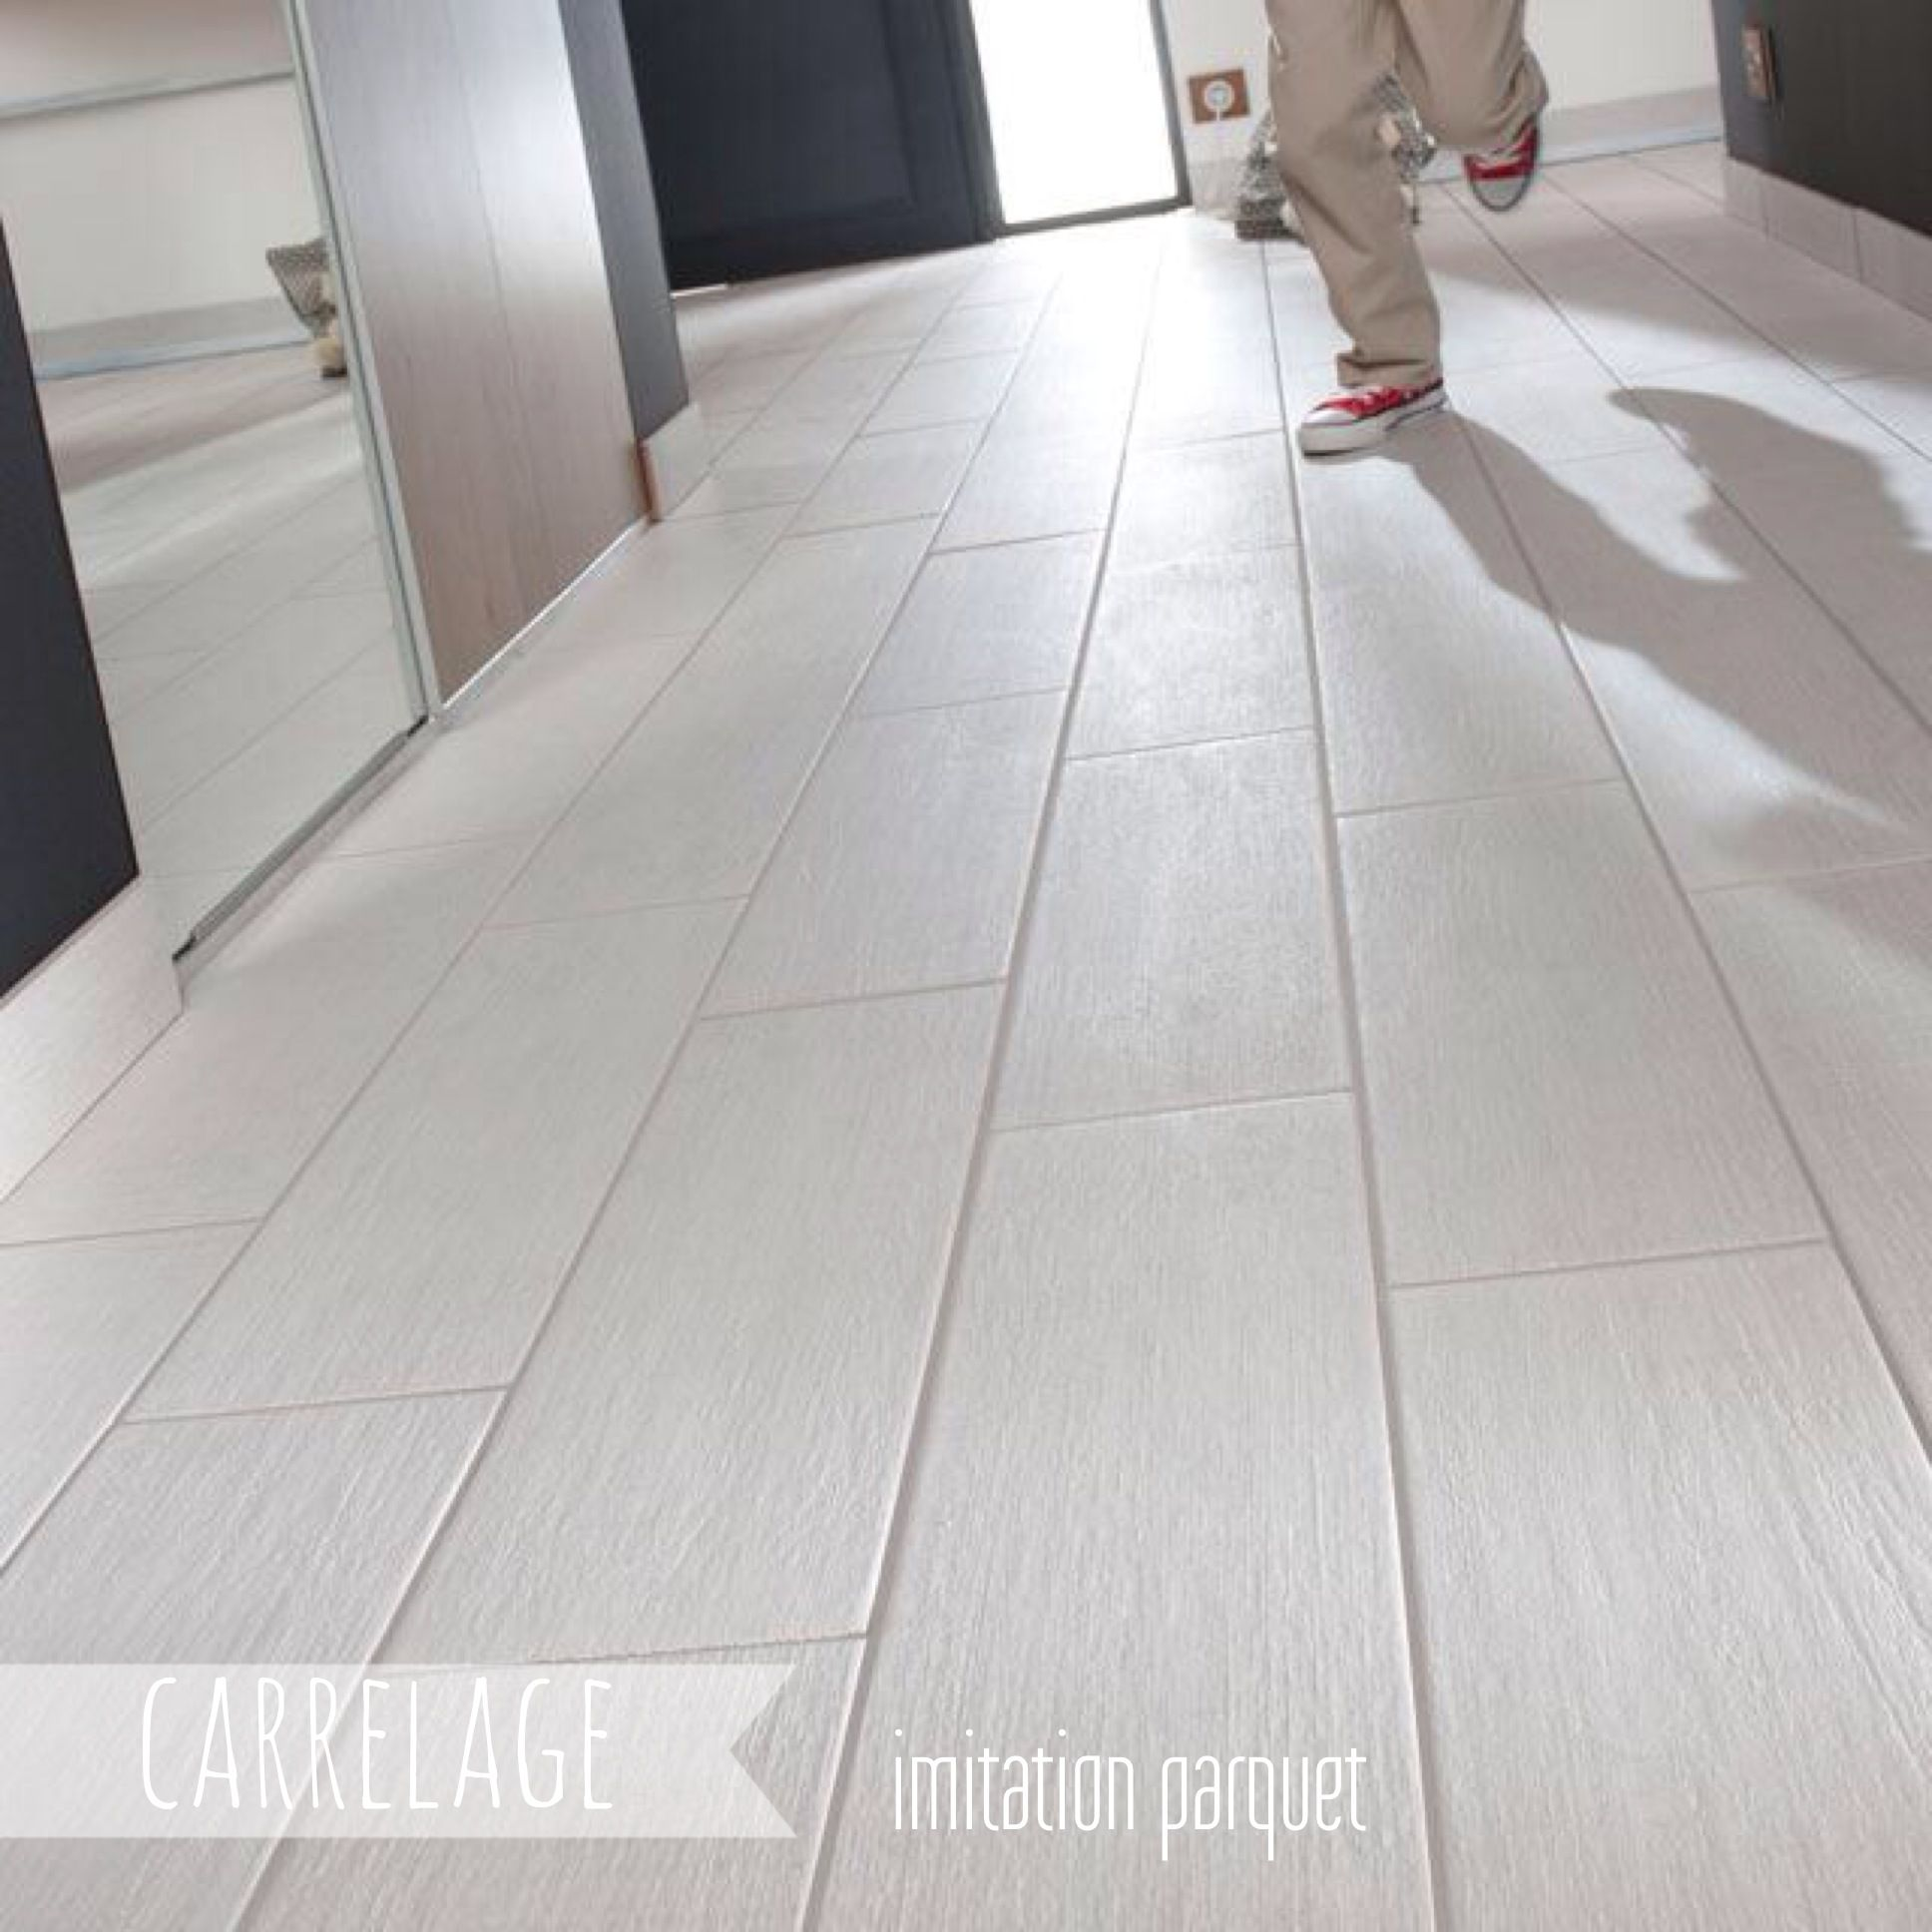 Carrelage Imitation Parquet 30X60 carrelage oikos gris clair | venus et judes